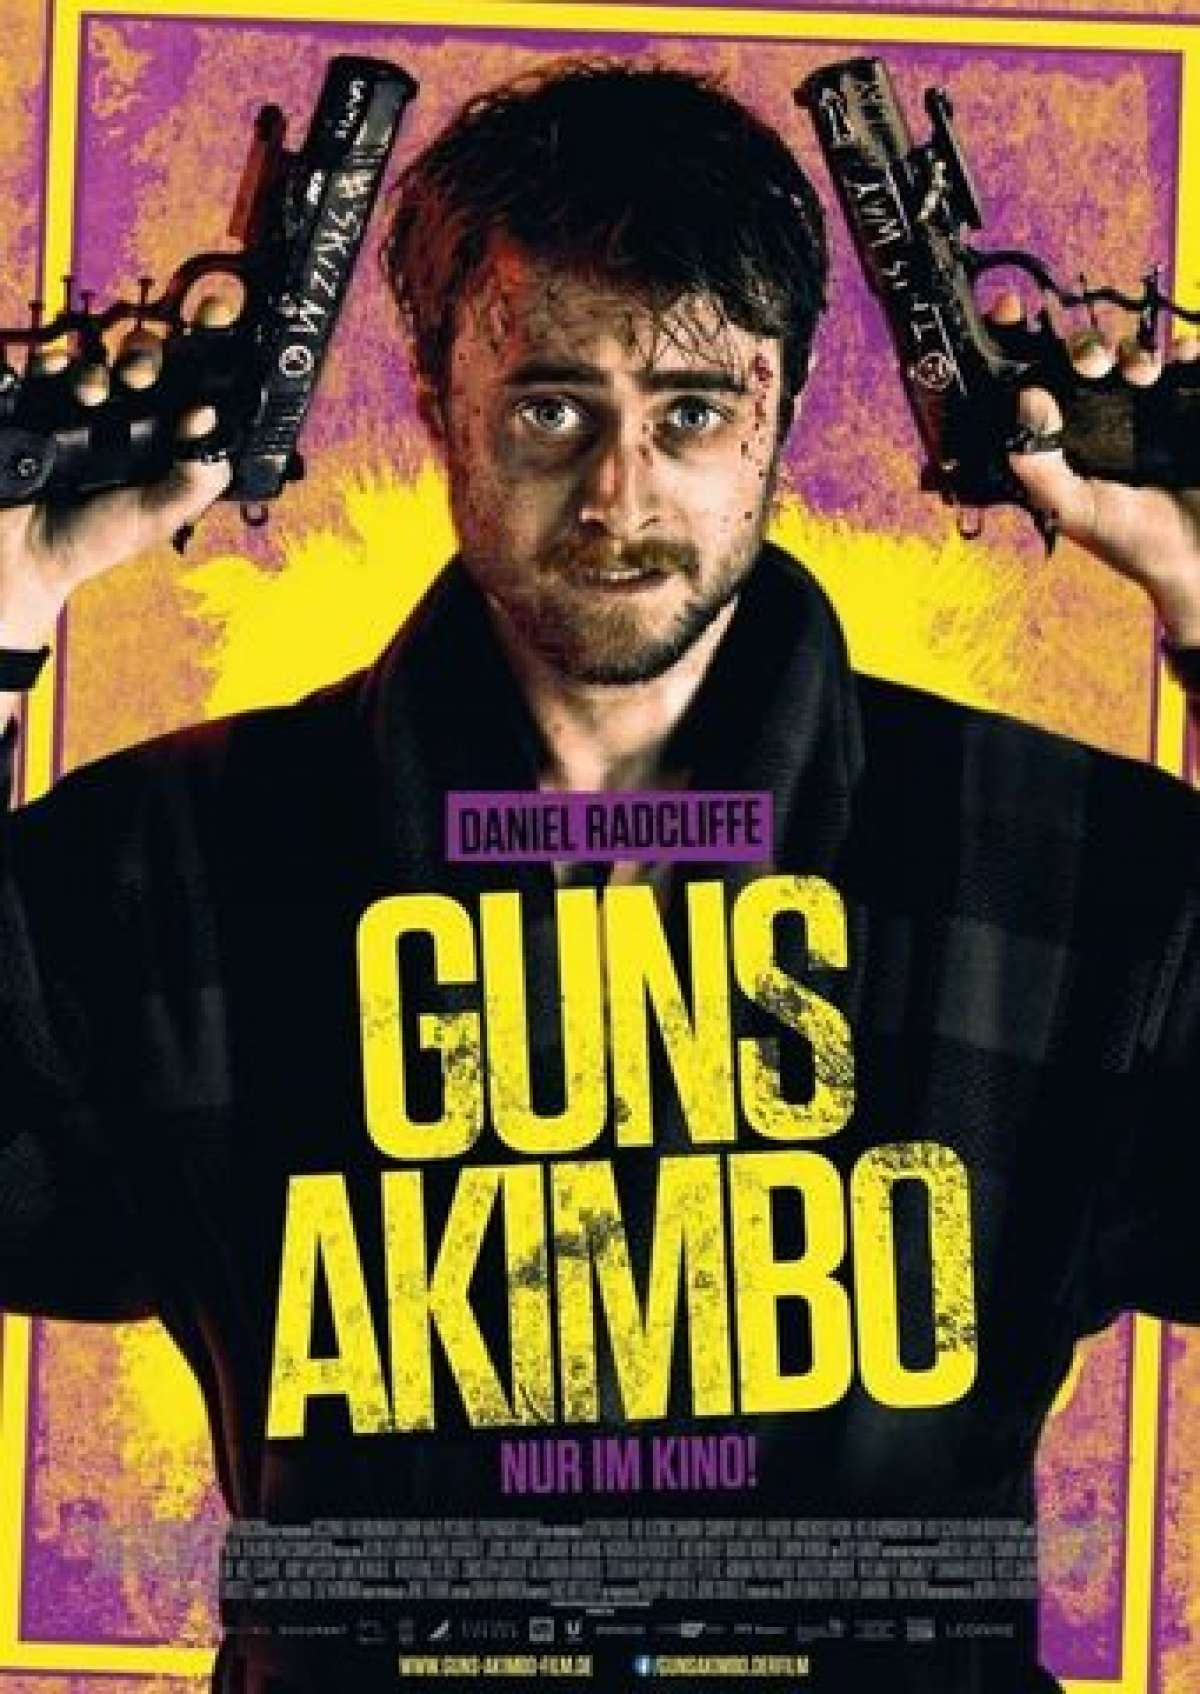 Guns Akimbo - Burg Theater Treysa - Schwalmstadt-Treysa